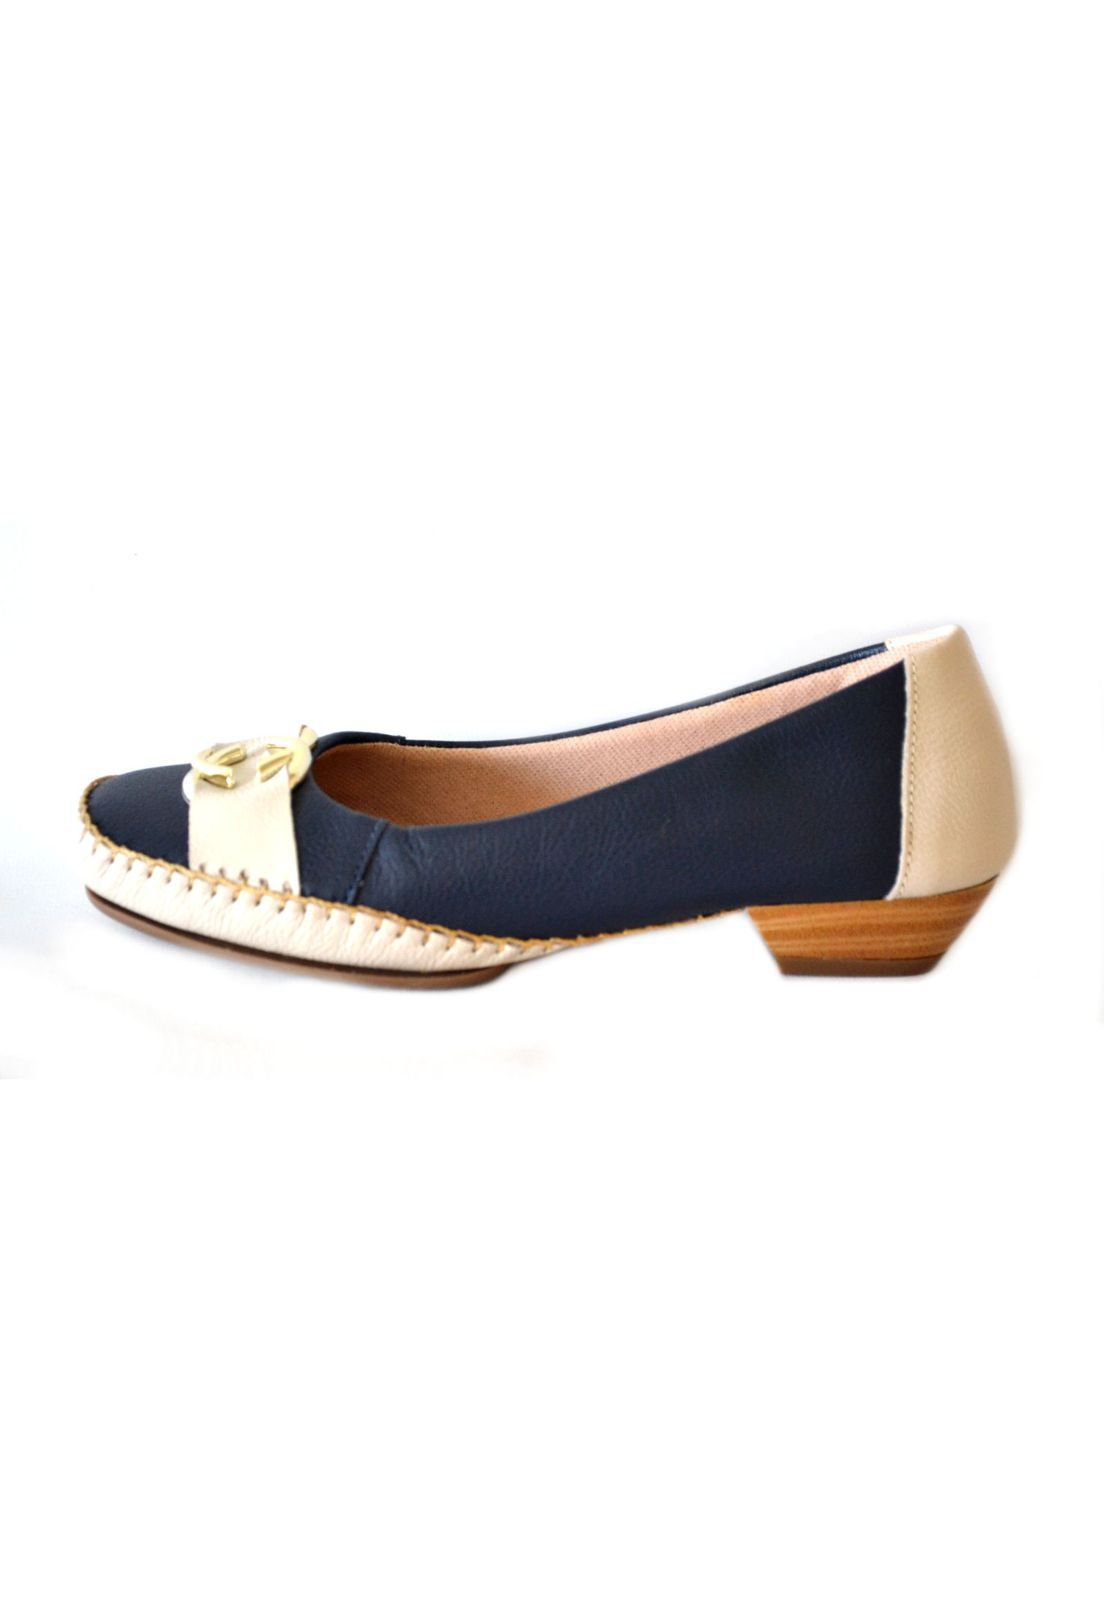 Sapato Feminino  Prata Couro Conforto 1009596 Marinho/Marfim